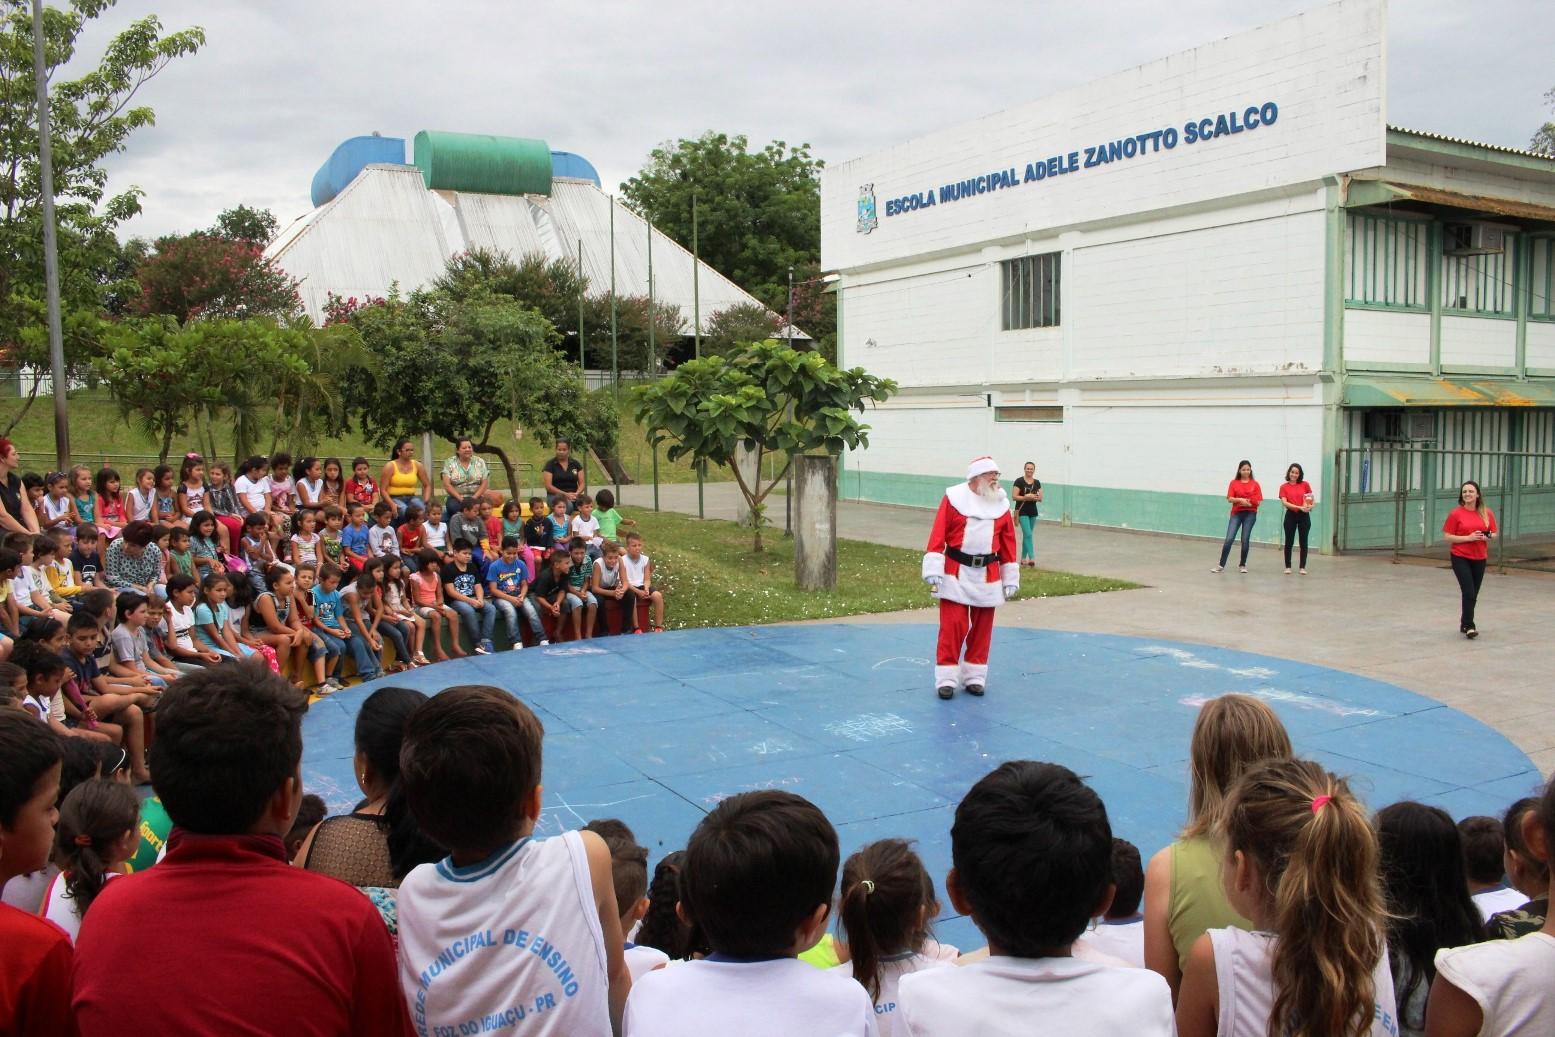 escola-municipal-adele-zanotto-scalco-jardim-eliza-ii